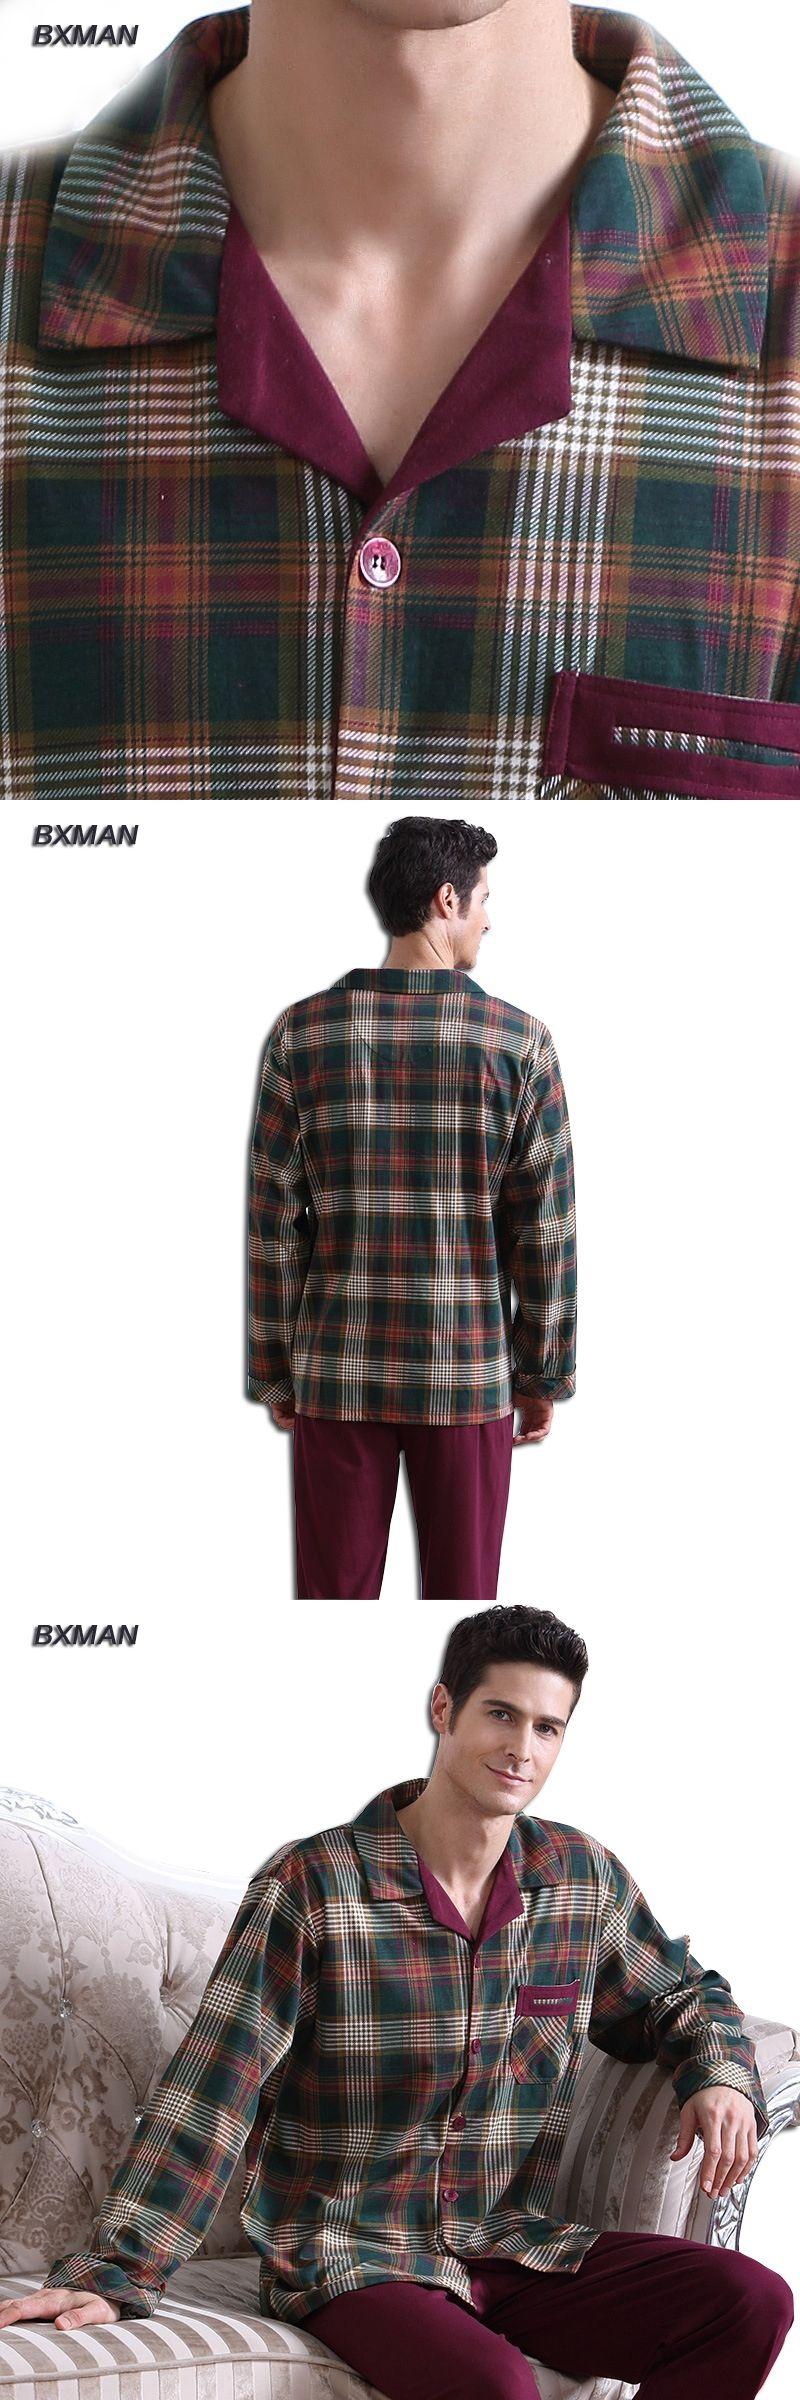 BXMAN Brand Men s Classic Pijamas Hombre Cotton Plaid Turn-down Collar Full Sleeve  Men Pajamas a1824c1c1